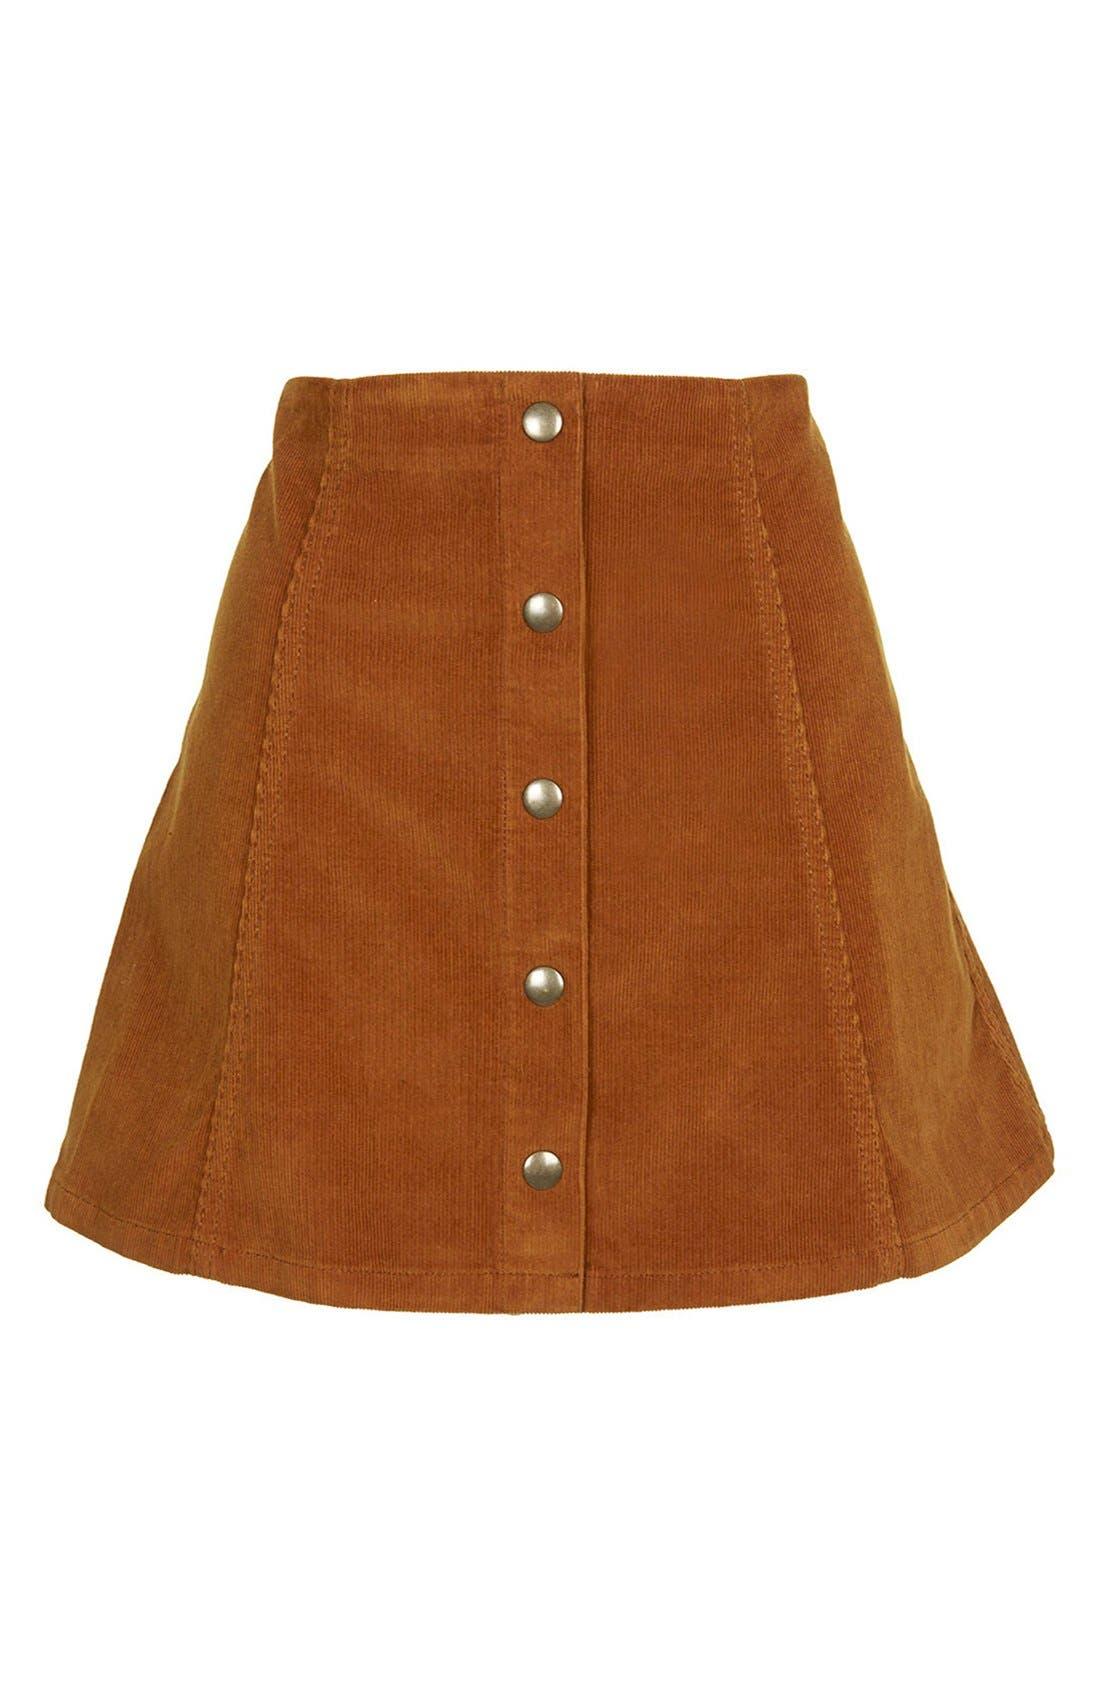 TOPSHOP, A-Line Corduroy Skirt, Alternate thumbnail 4, color, 210